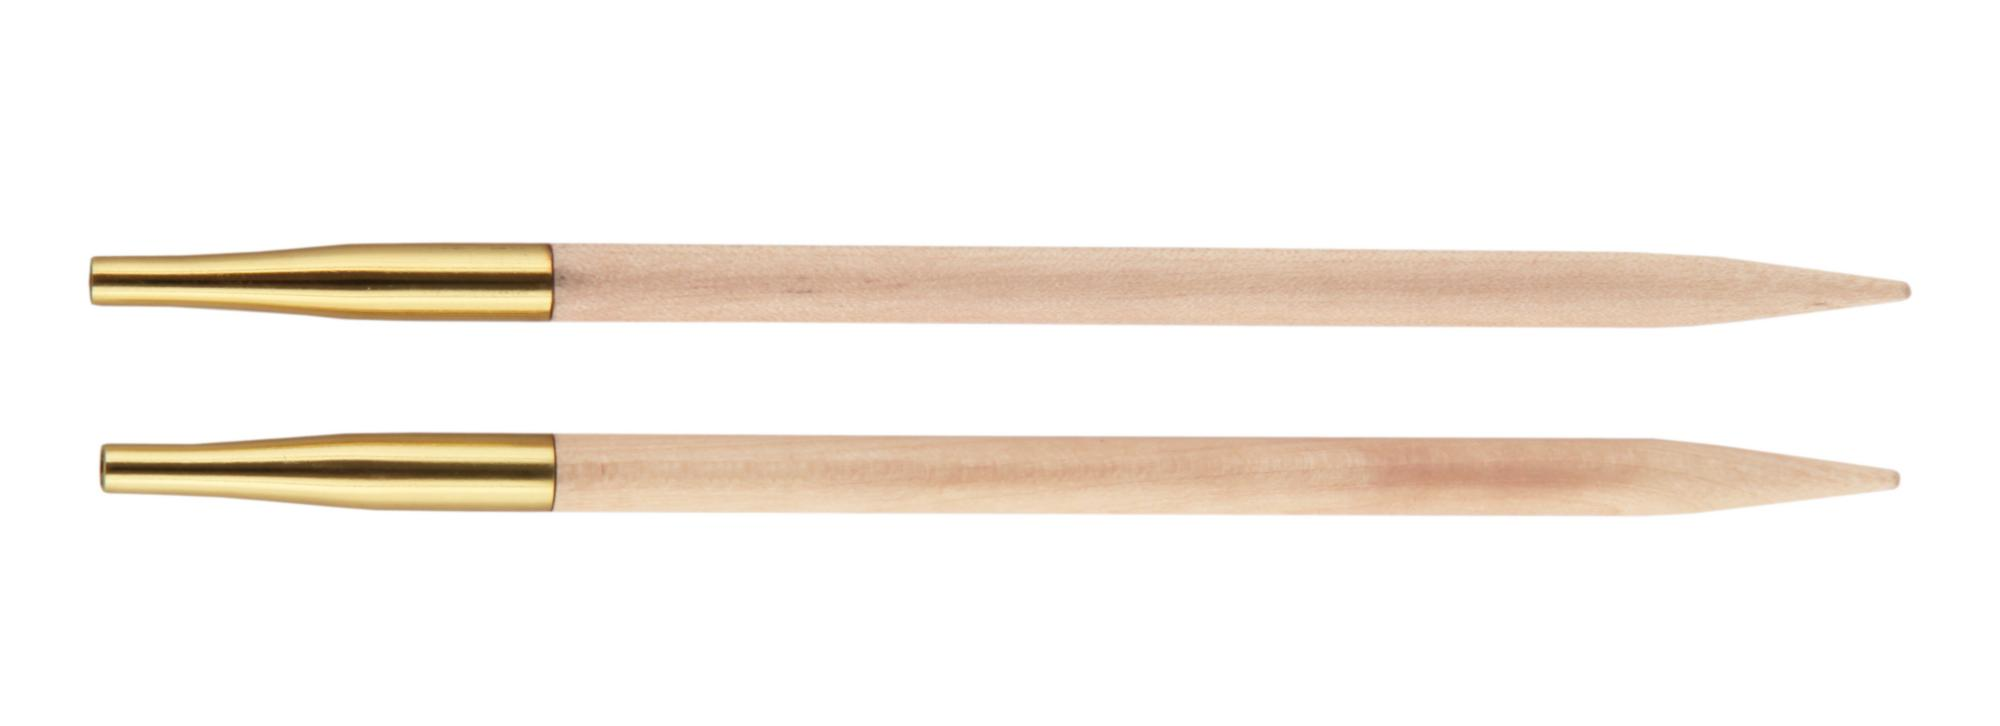 Спицы съемные короткие Basix Birch Wood KnitPro, 35651, 3.00 мм